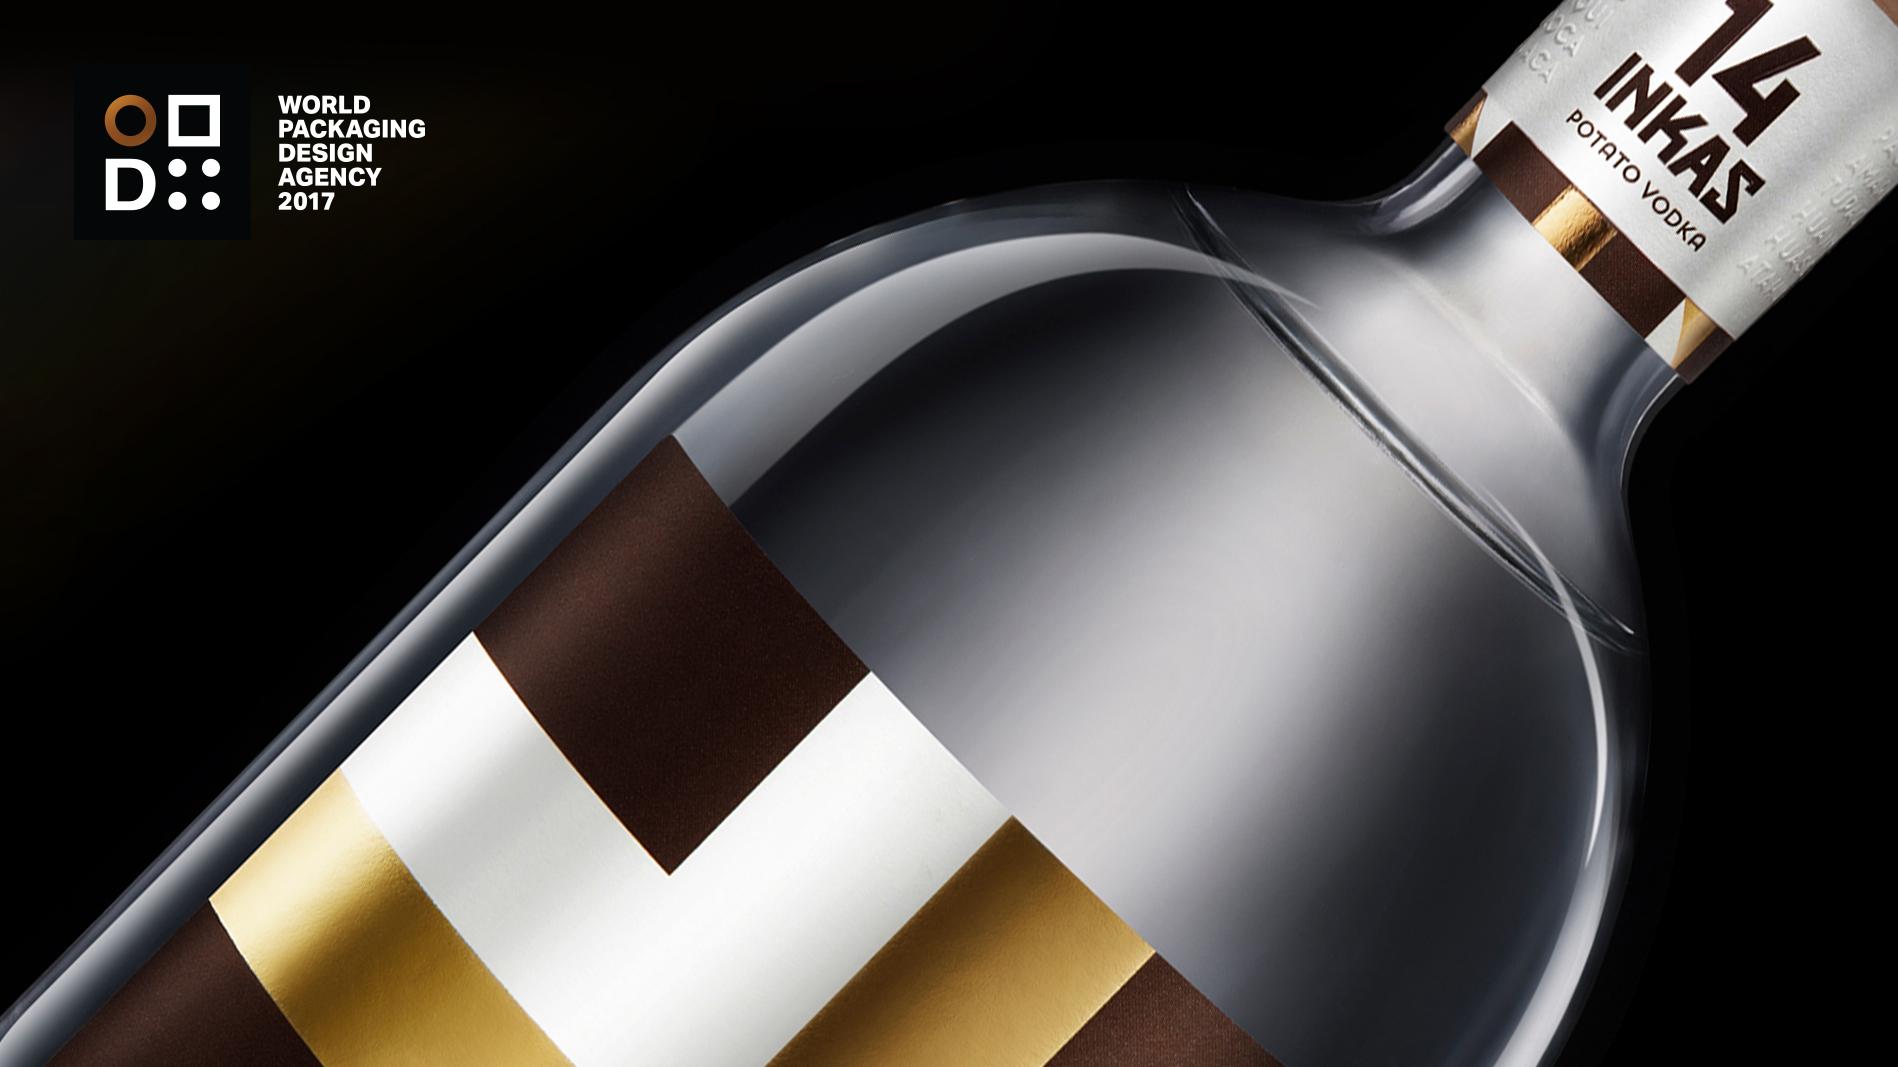 8-is-creative-studio-world-packaging-design-society.jpg